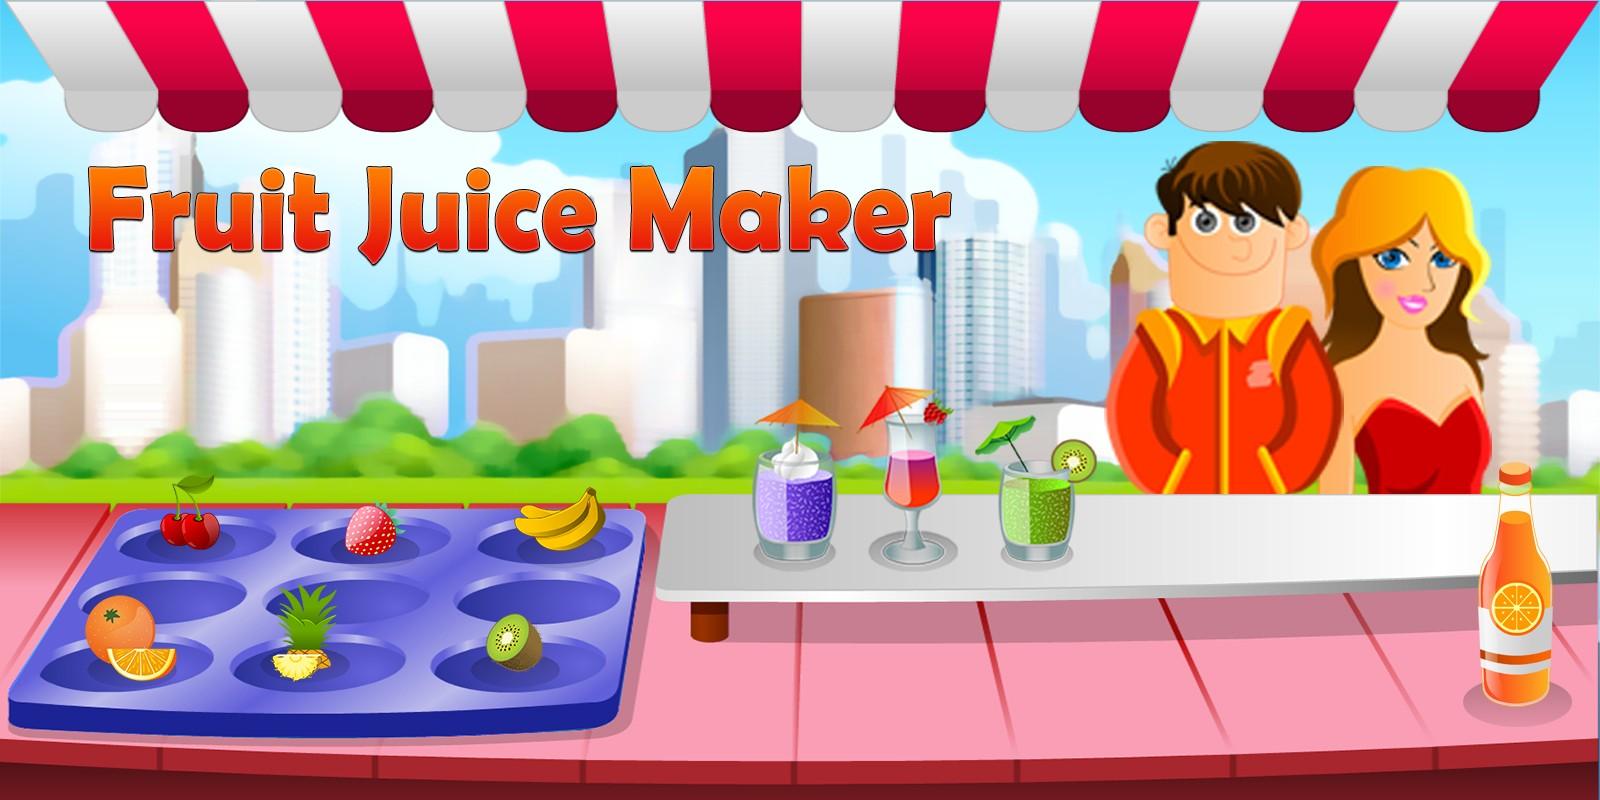 Fruit Juice Maker - Complete Unity Project